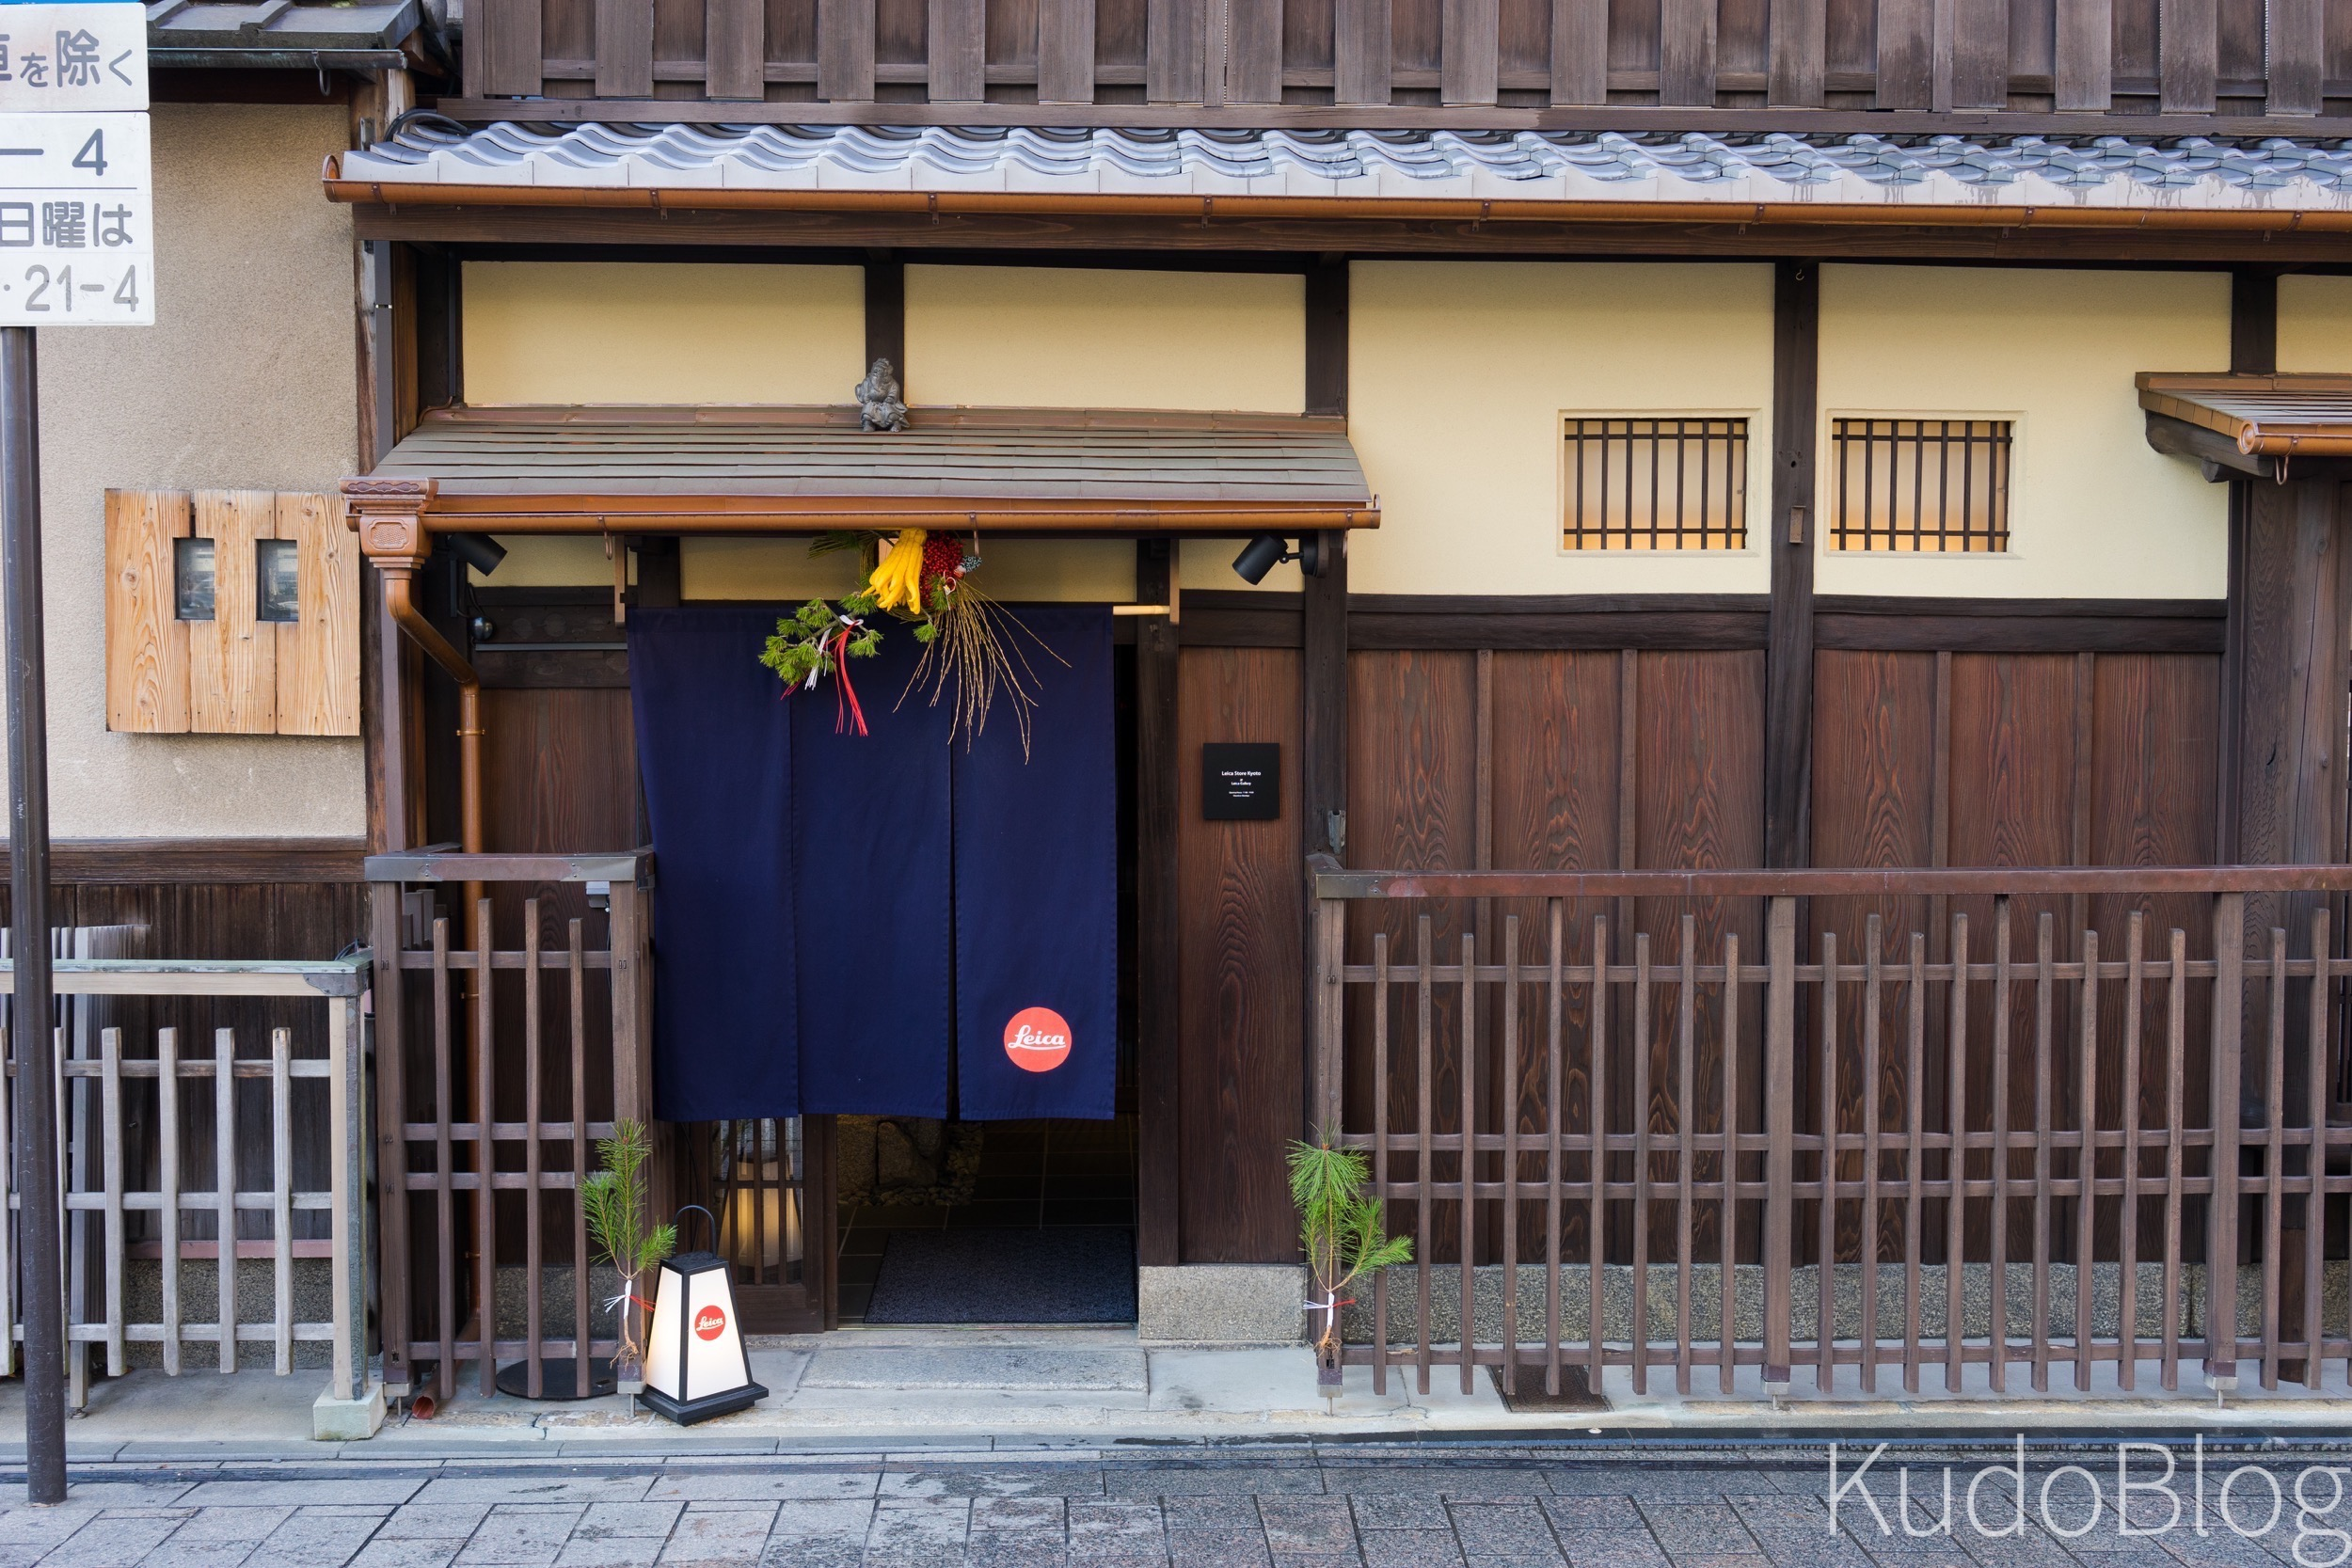 20140103 Kansai 2-46